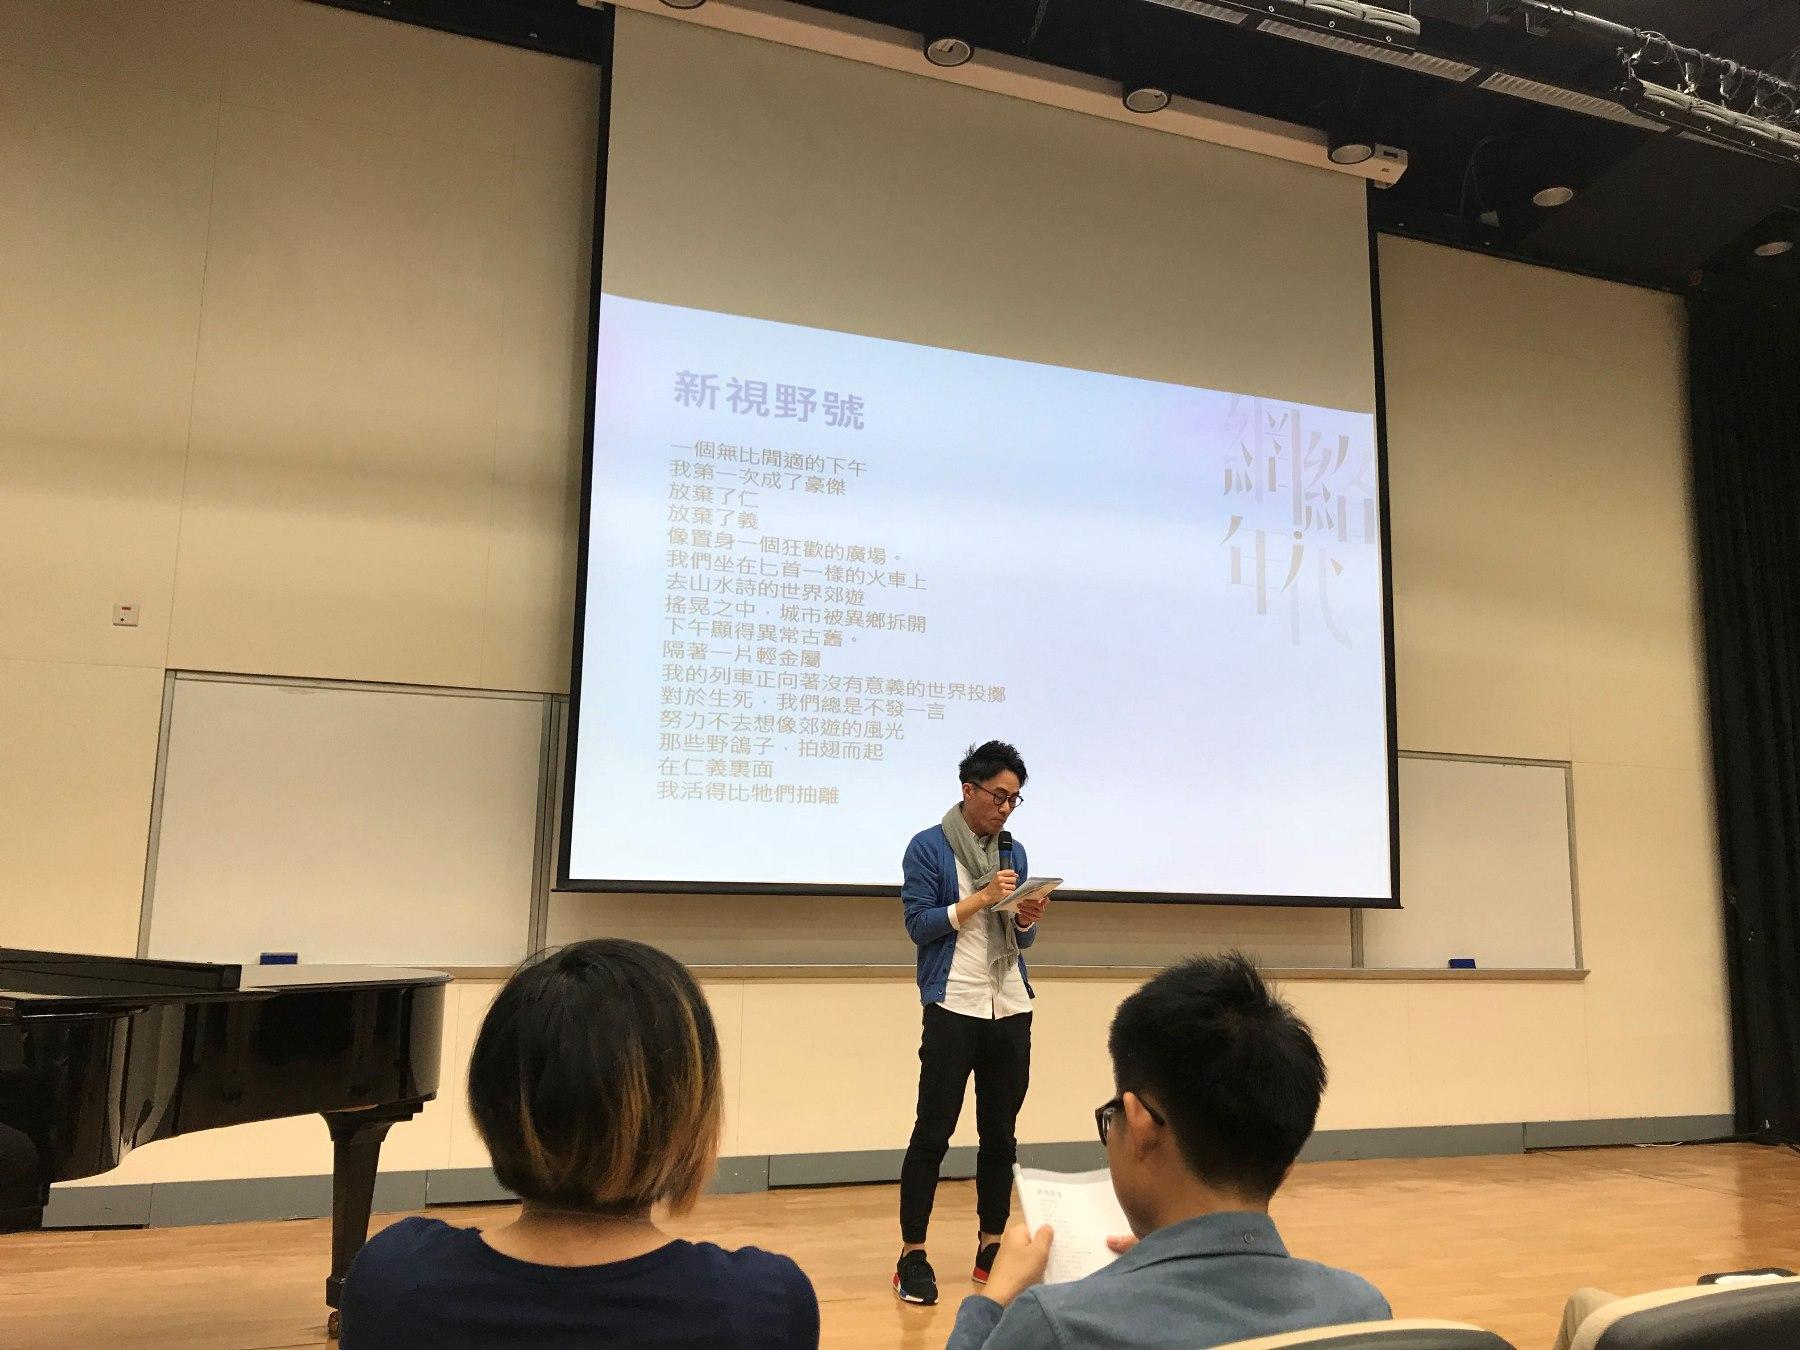 https://www.npc.edu.hk/sites/default/files/img_6193.jpeg